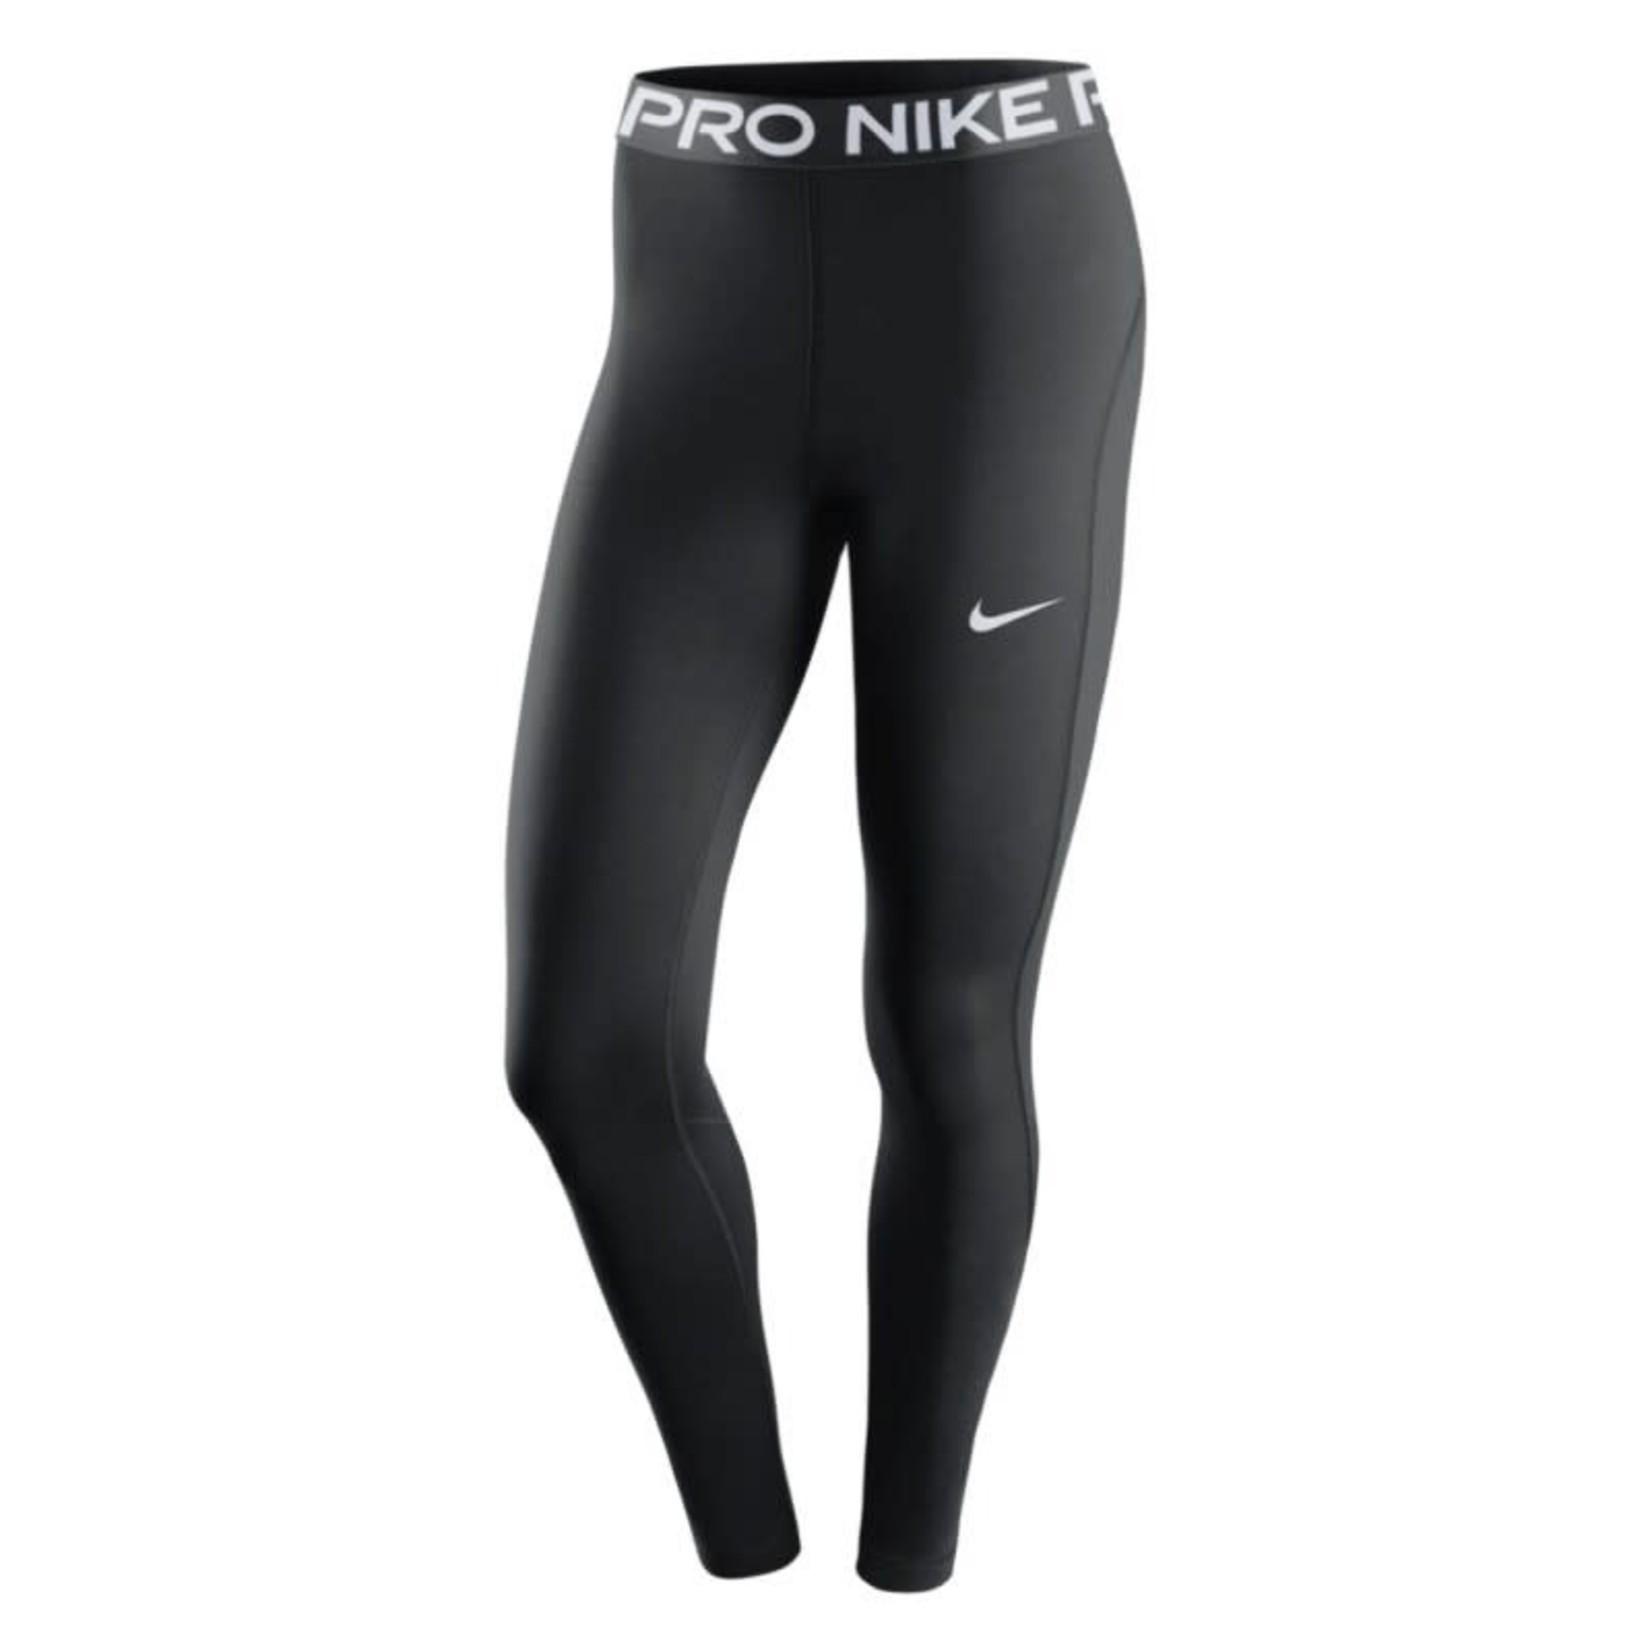 Nike Nike Leggings, Nike Pro 365 Tight, Ladies